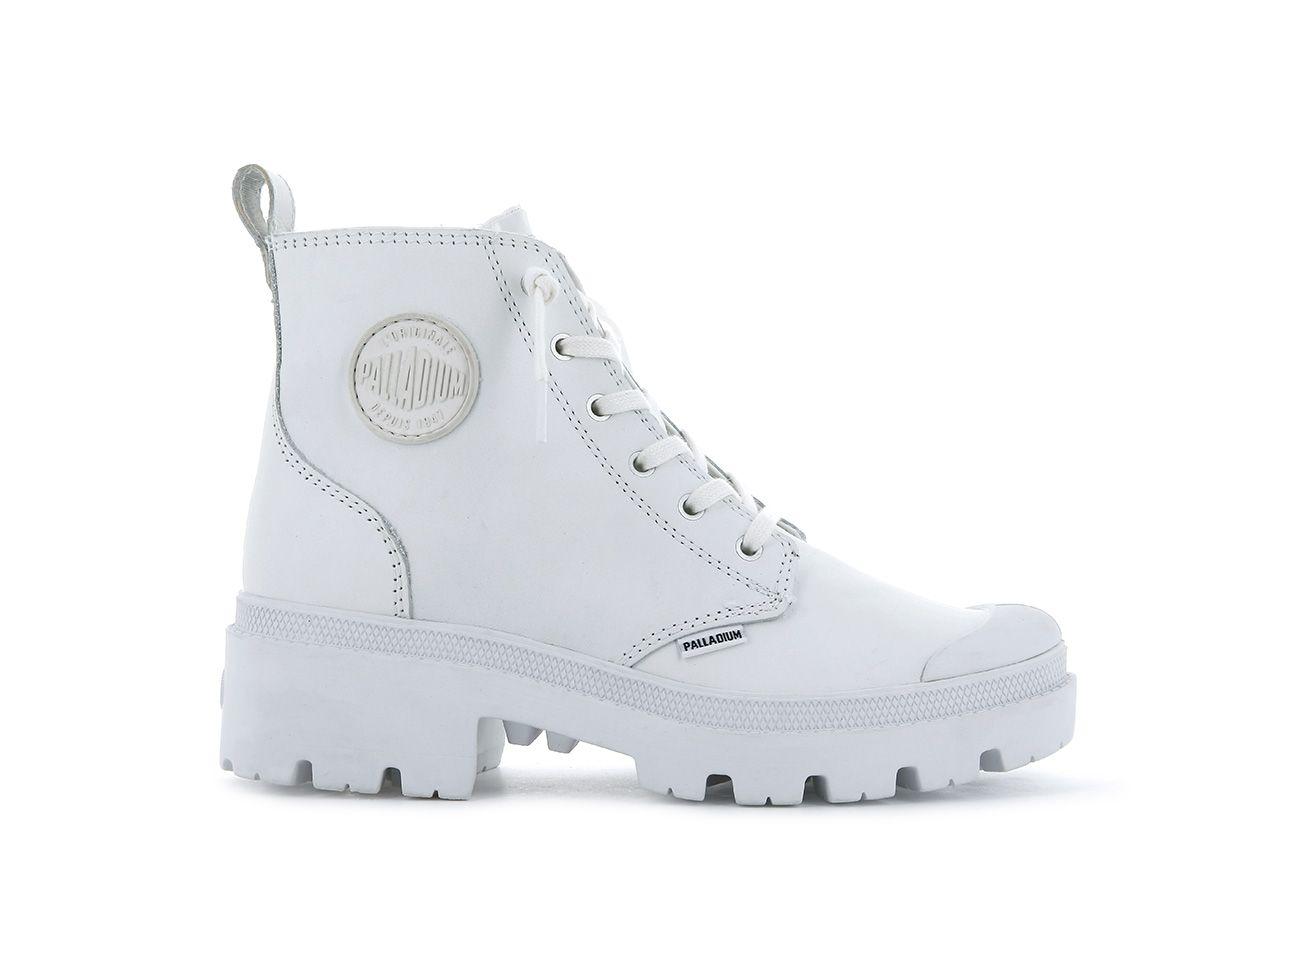 Palladium Women's Pallabase Leather in White/White